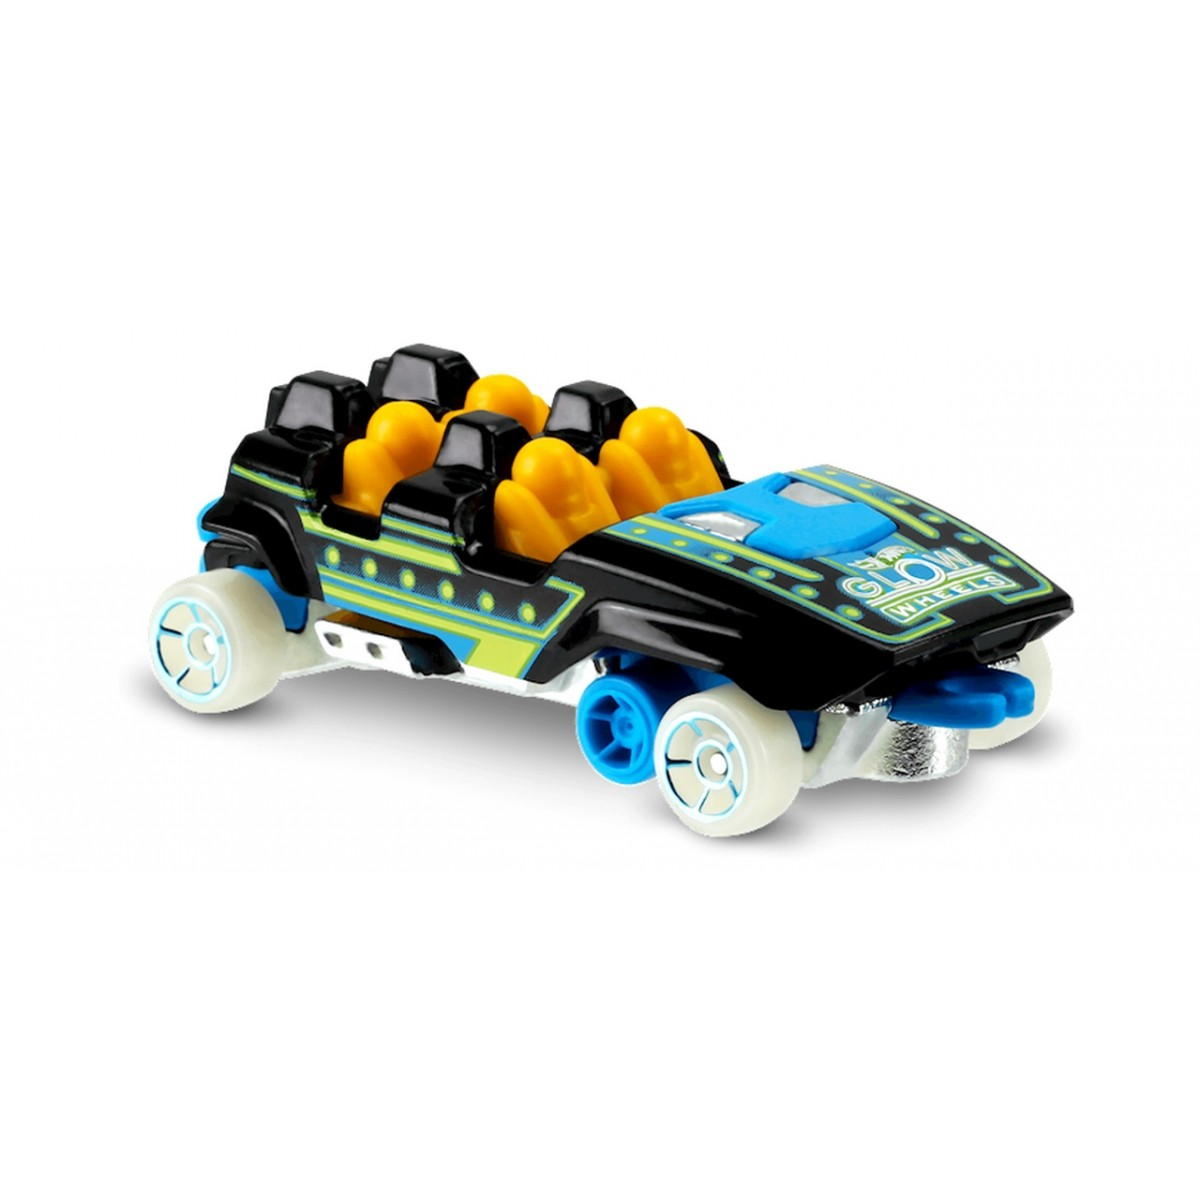 Carrinho Hot Wheels: Loopster Preto